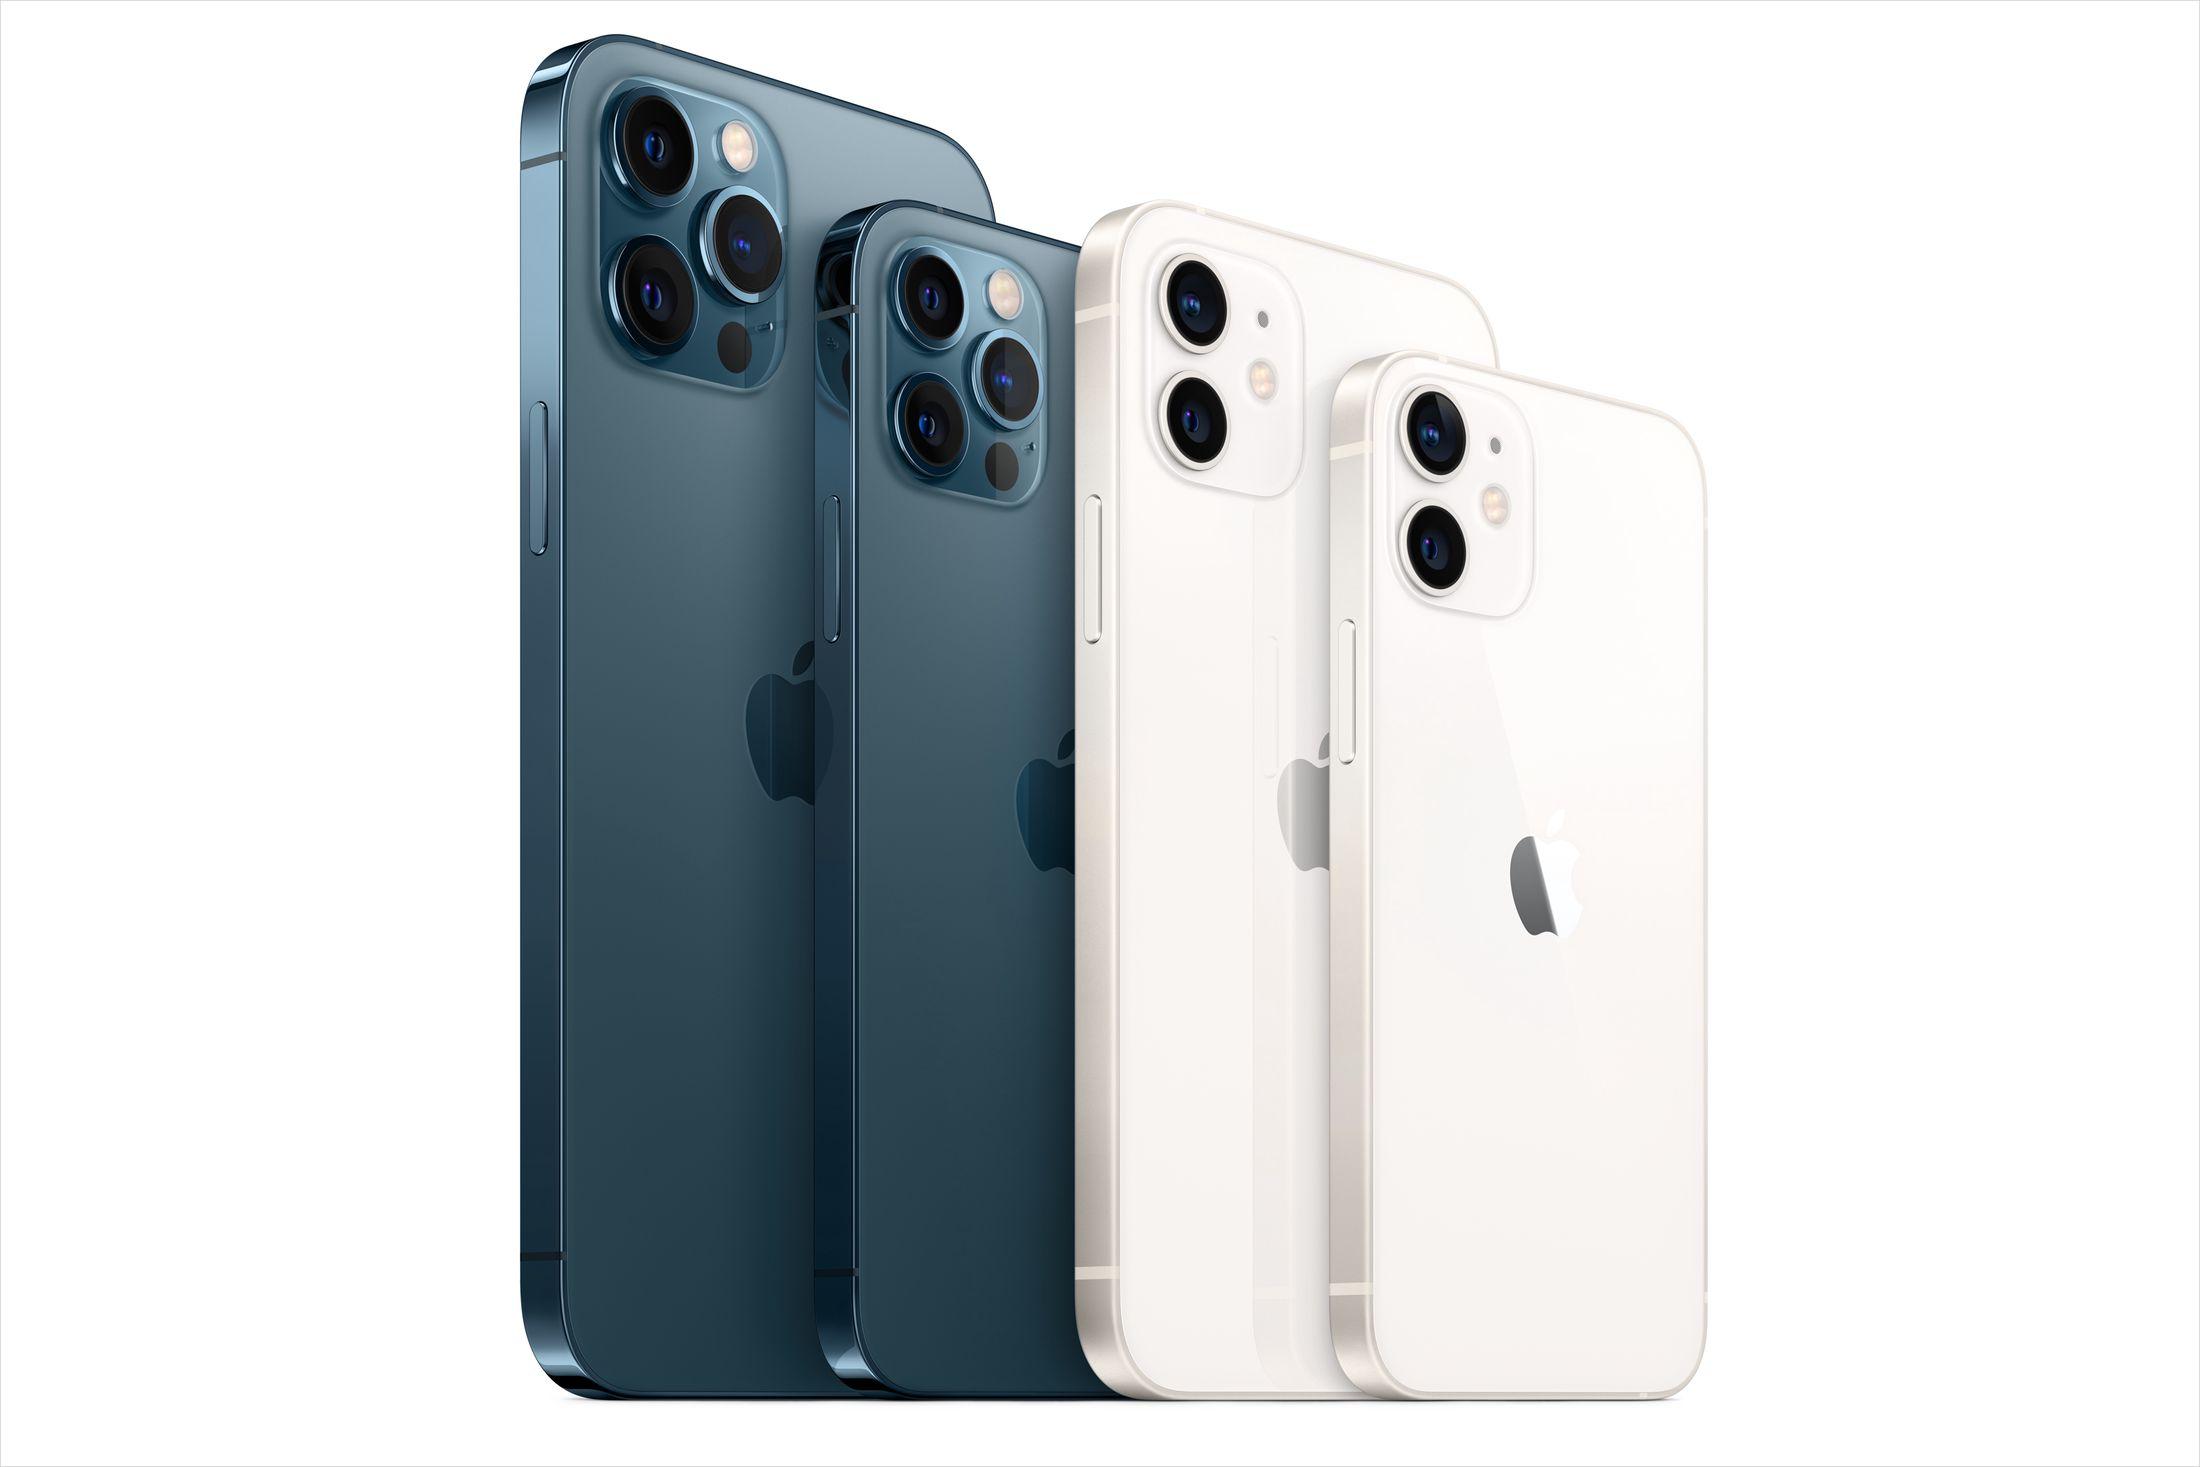 iPhone 12 2020 series